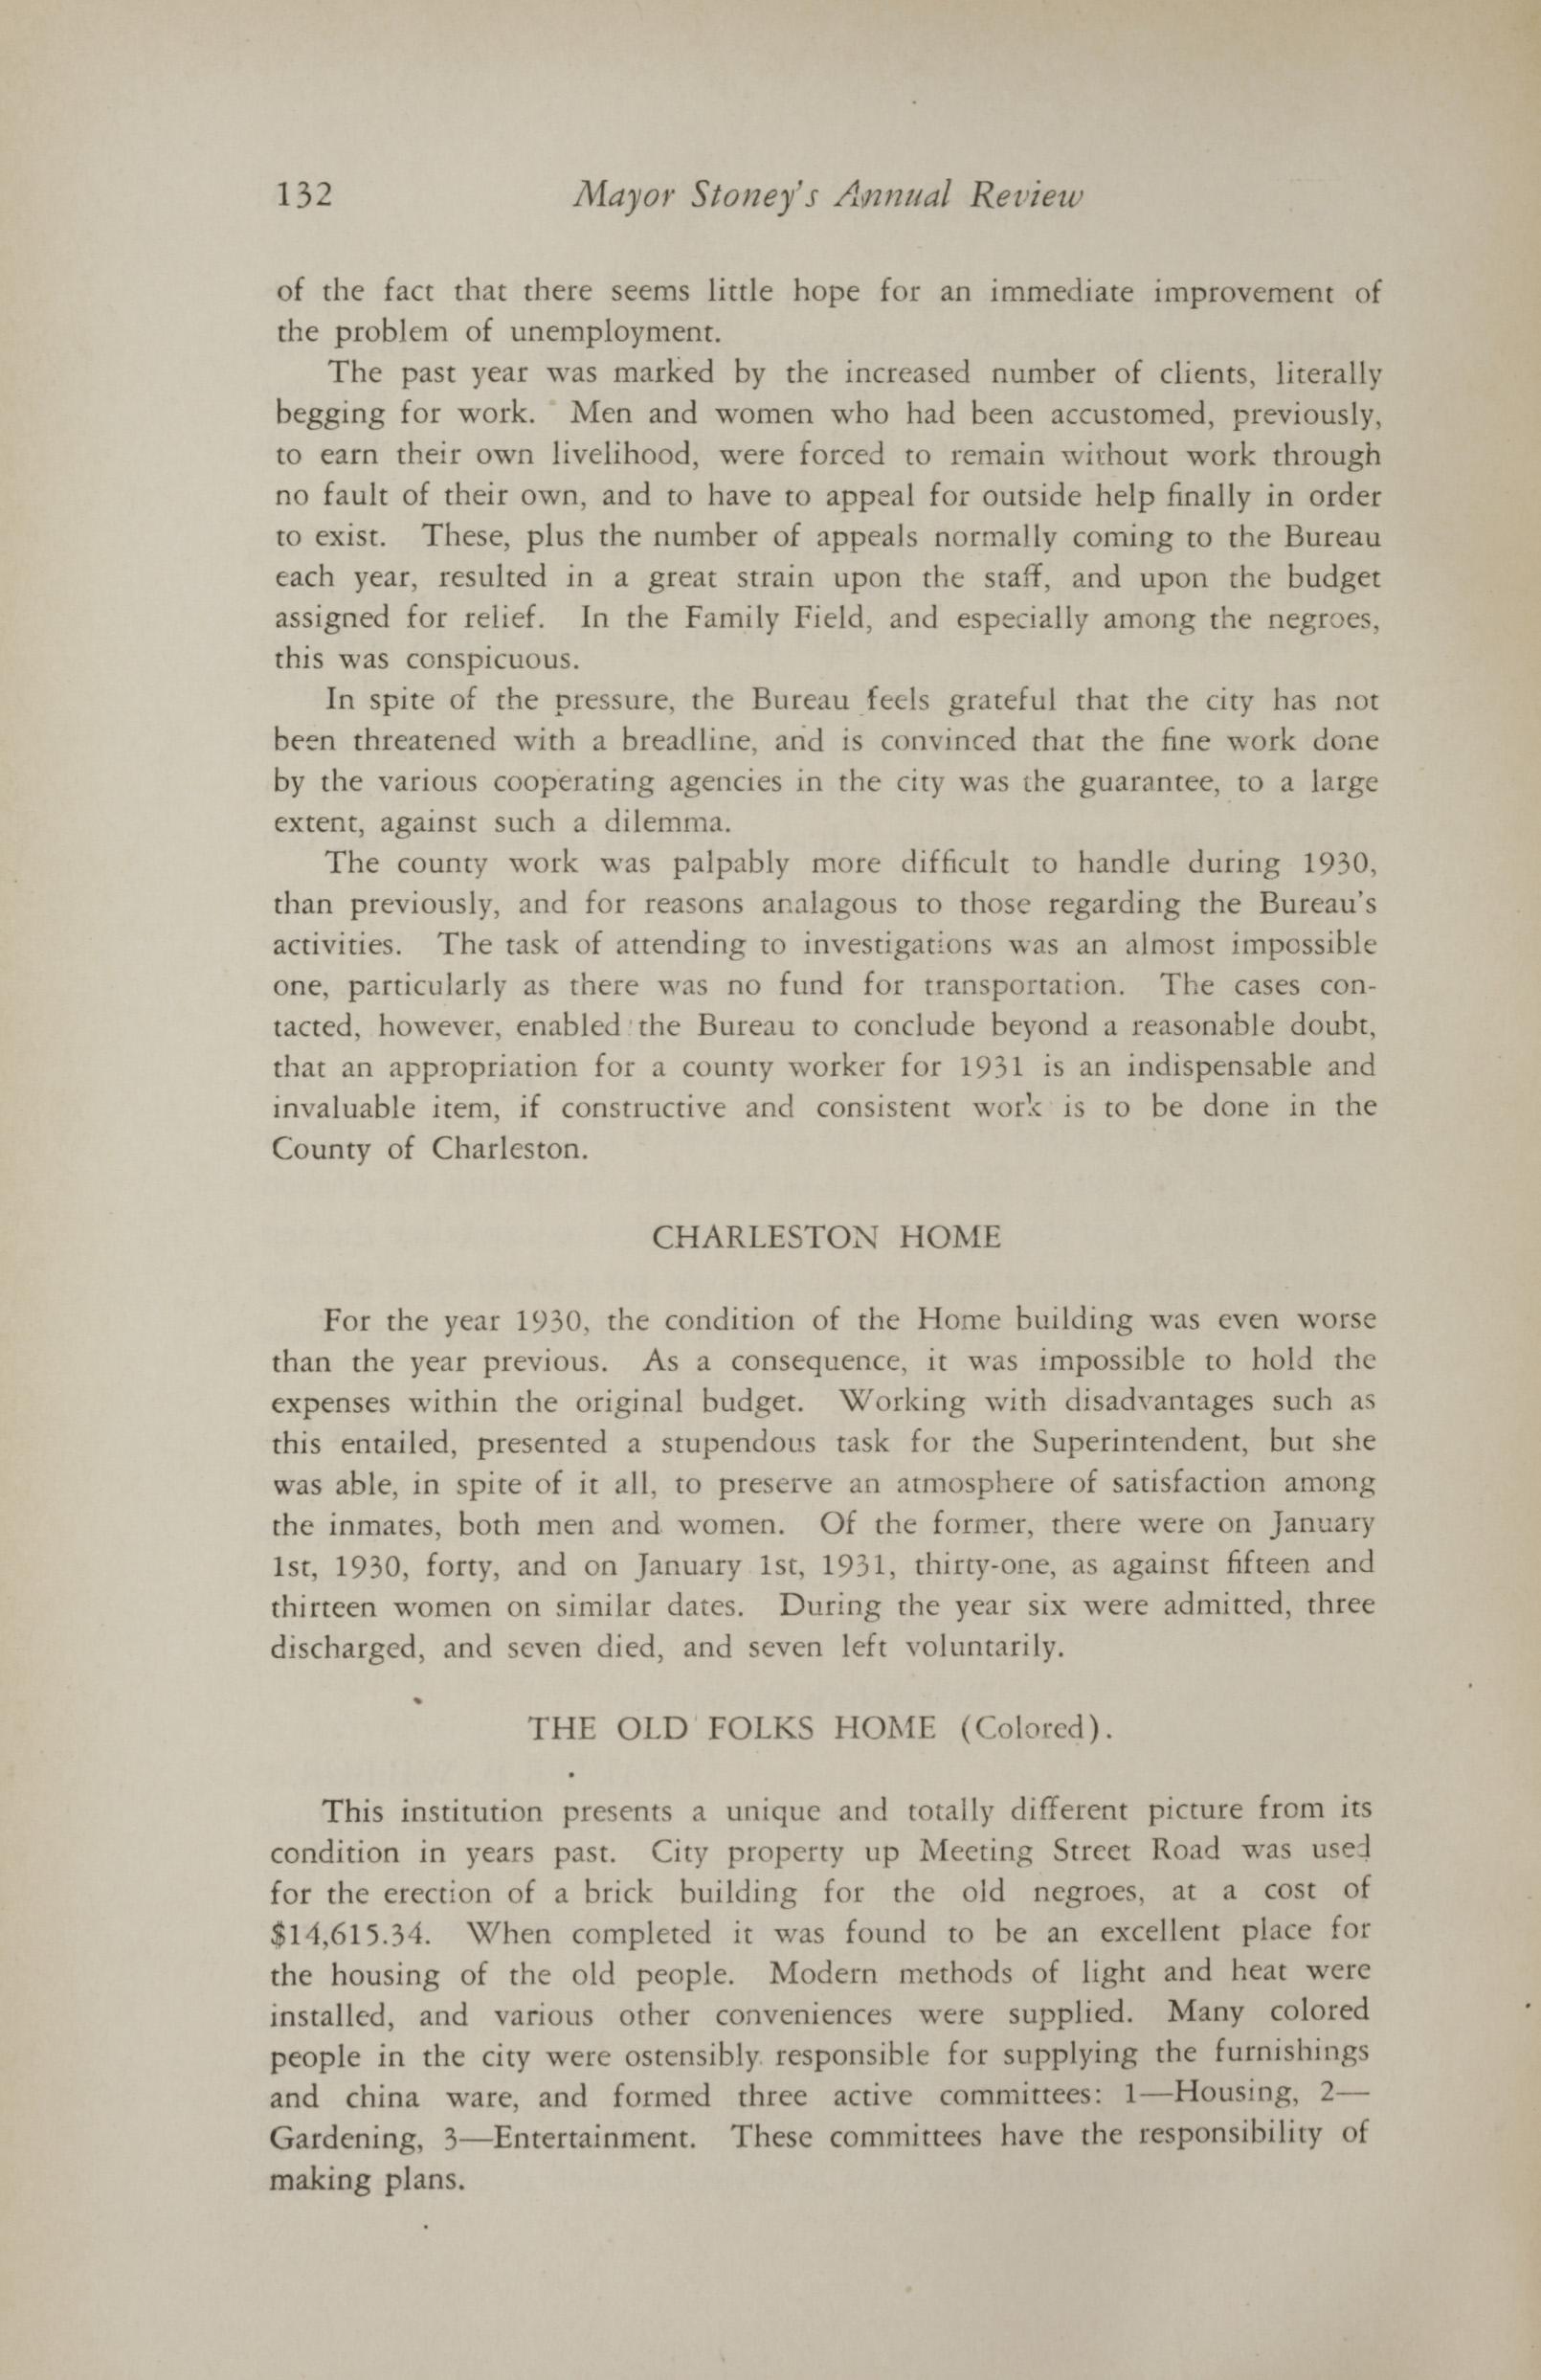 Charleston Yearbook, 1930, page 132